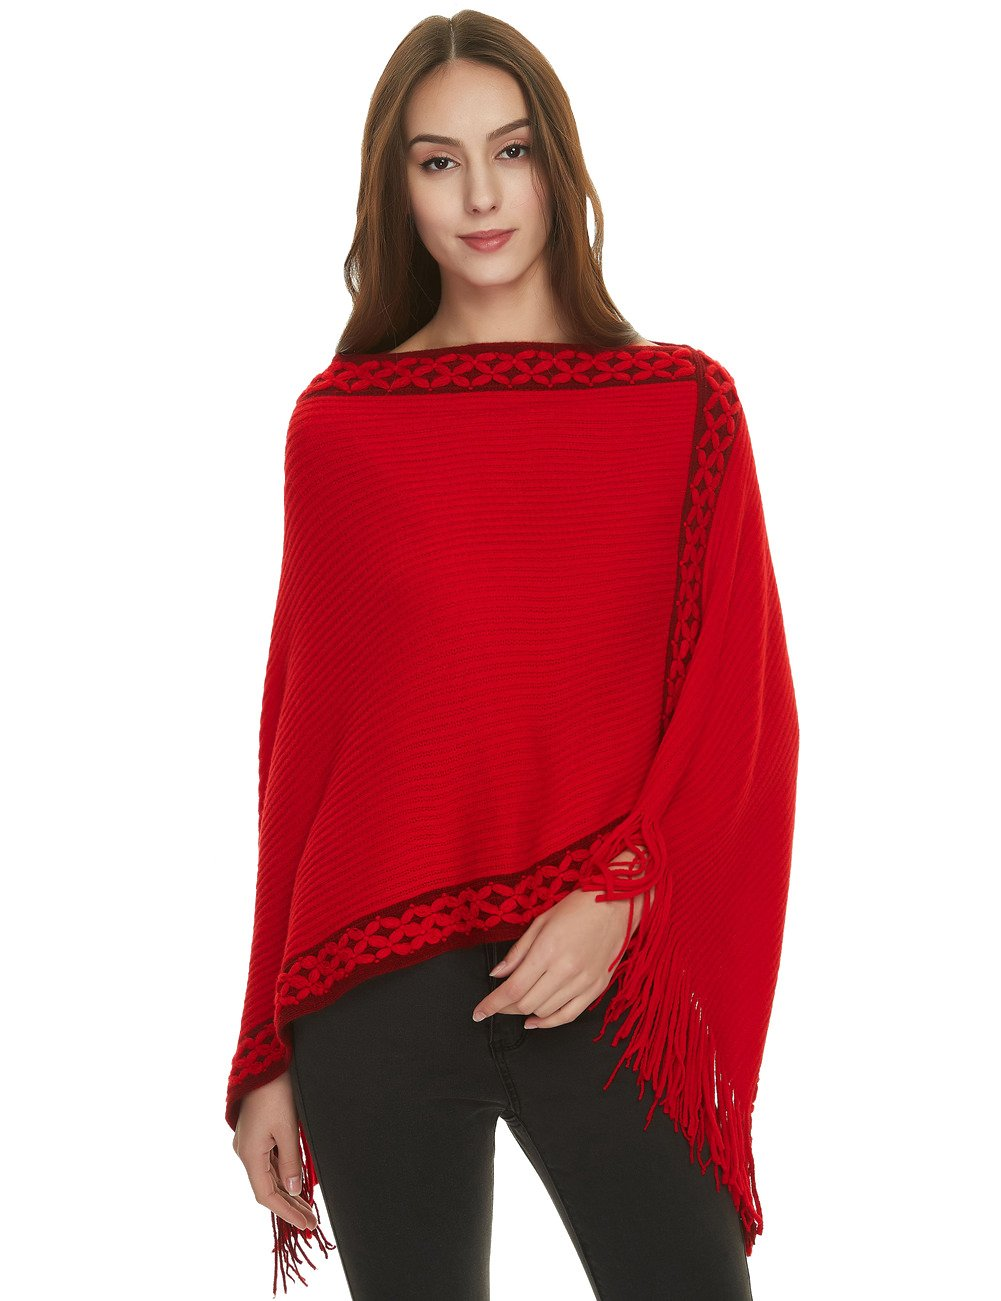 Ferand Women's Crisscross Embroidered Poncho Sweater Stylish Fringe Cape Shawl Black